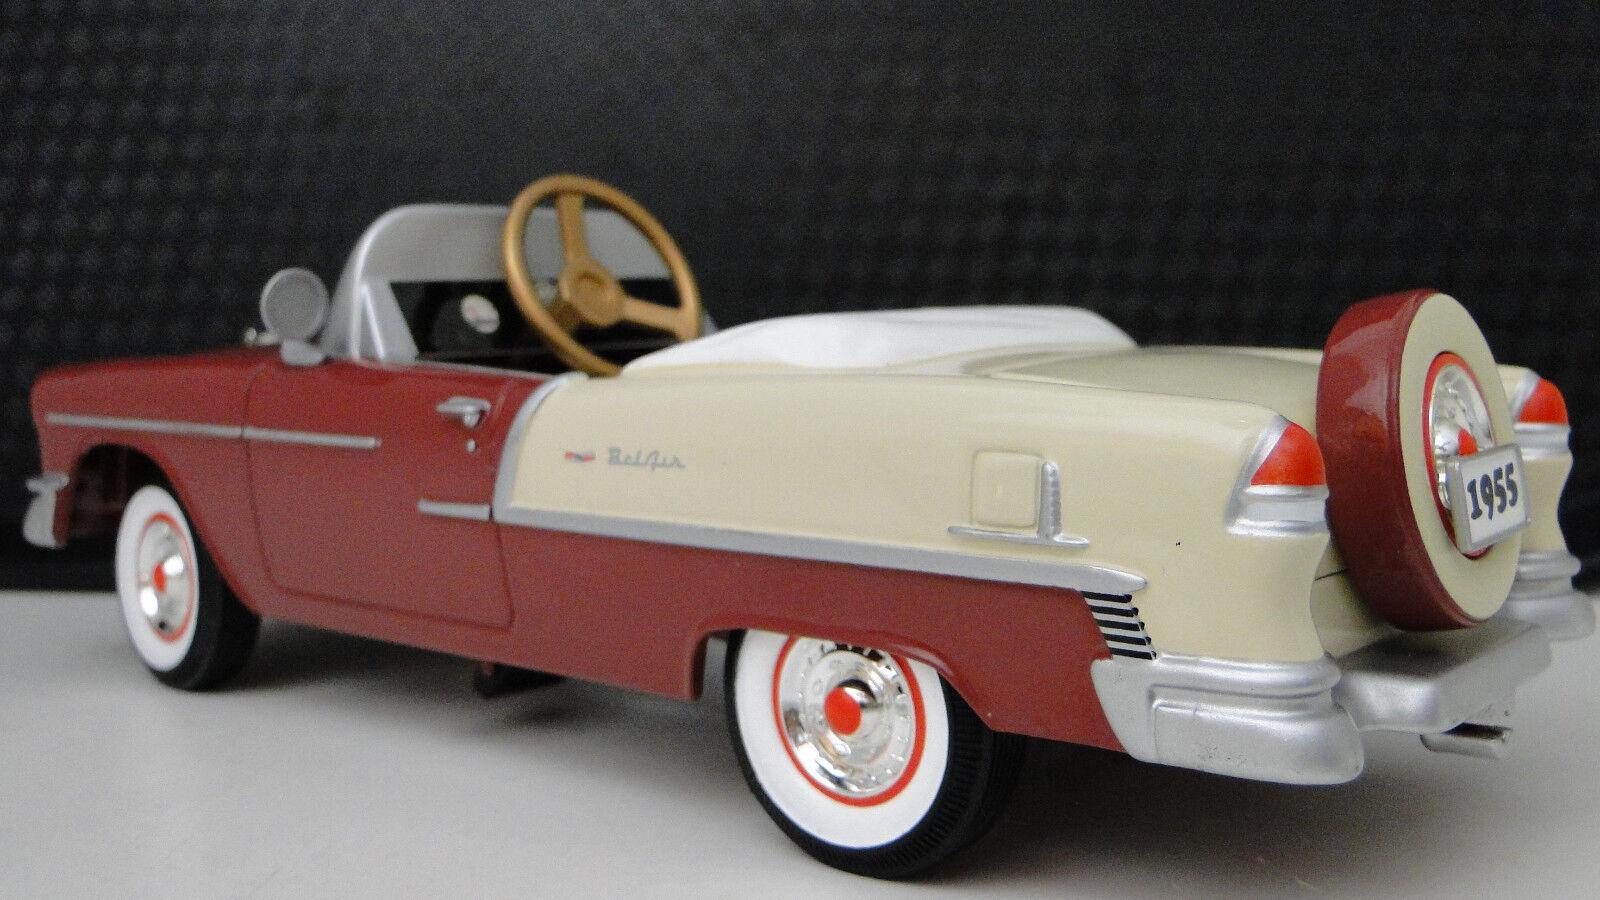 1955 Chevy Pedal bil årgång BelAir Metal samlaor 1957   UPPFYLLD BESKRIVNING